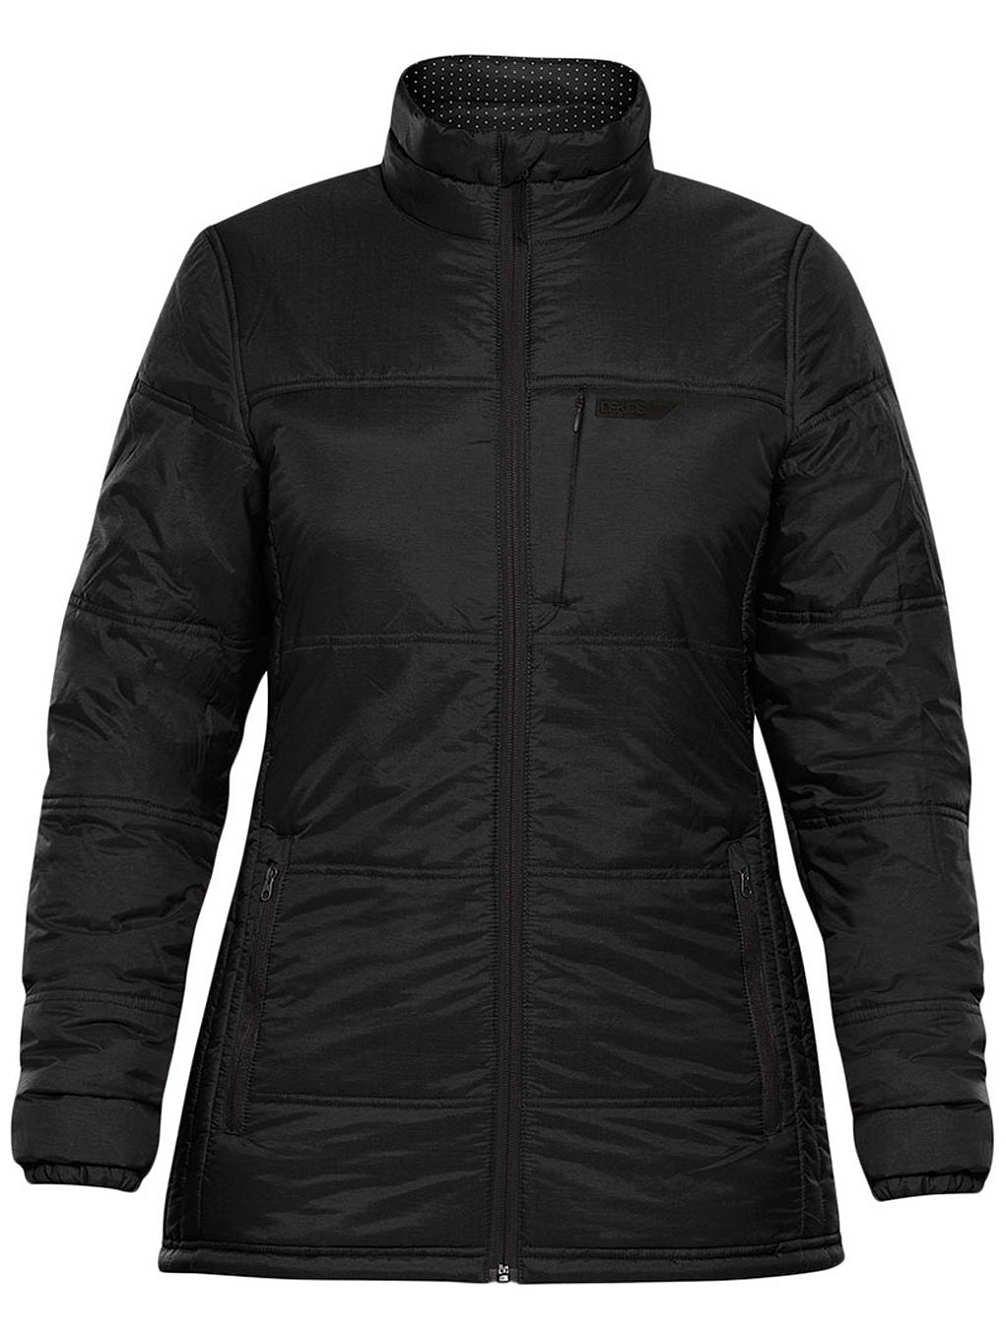 Damen Snowboard Jacke Dakine Pinebrook Jacket jetzt kaufen